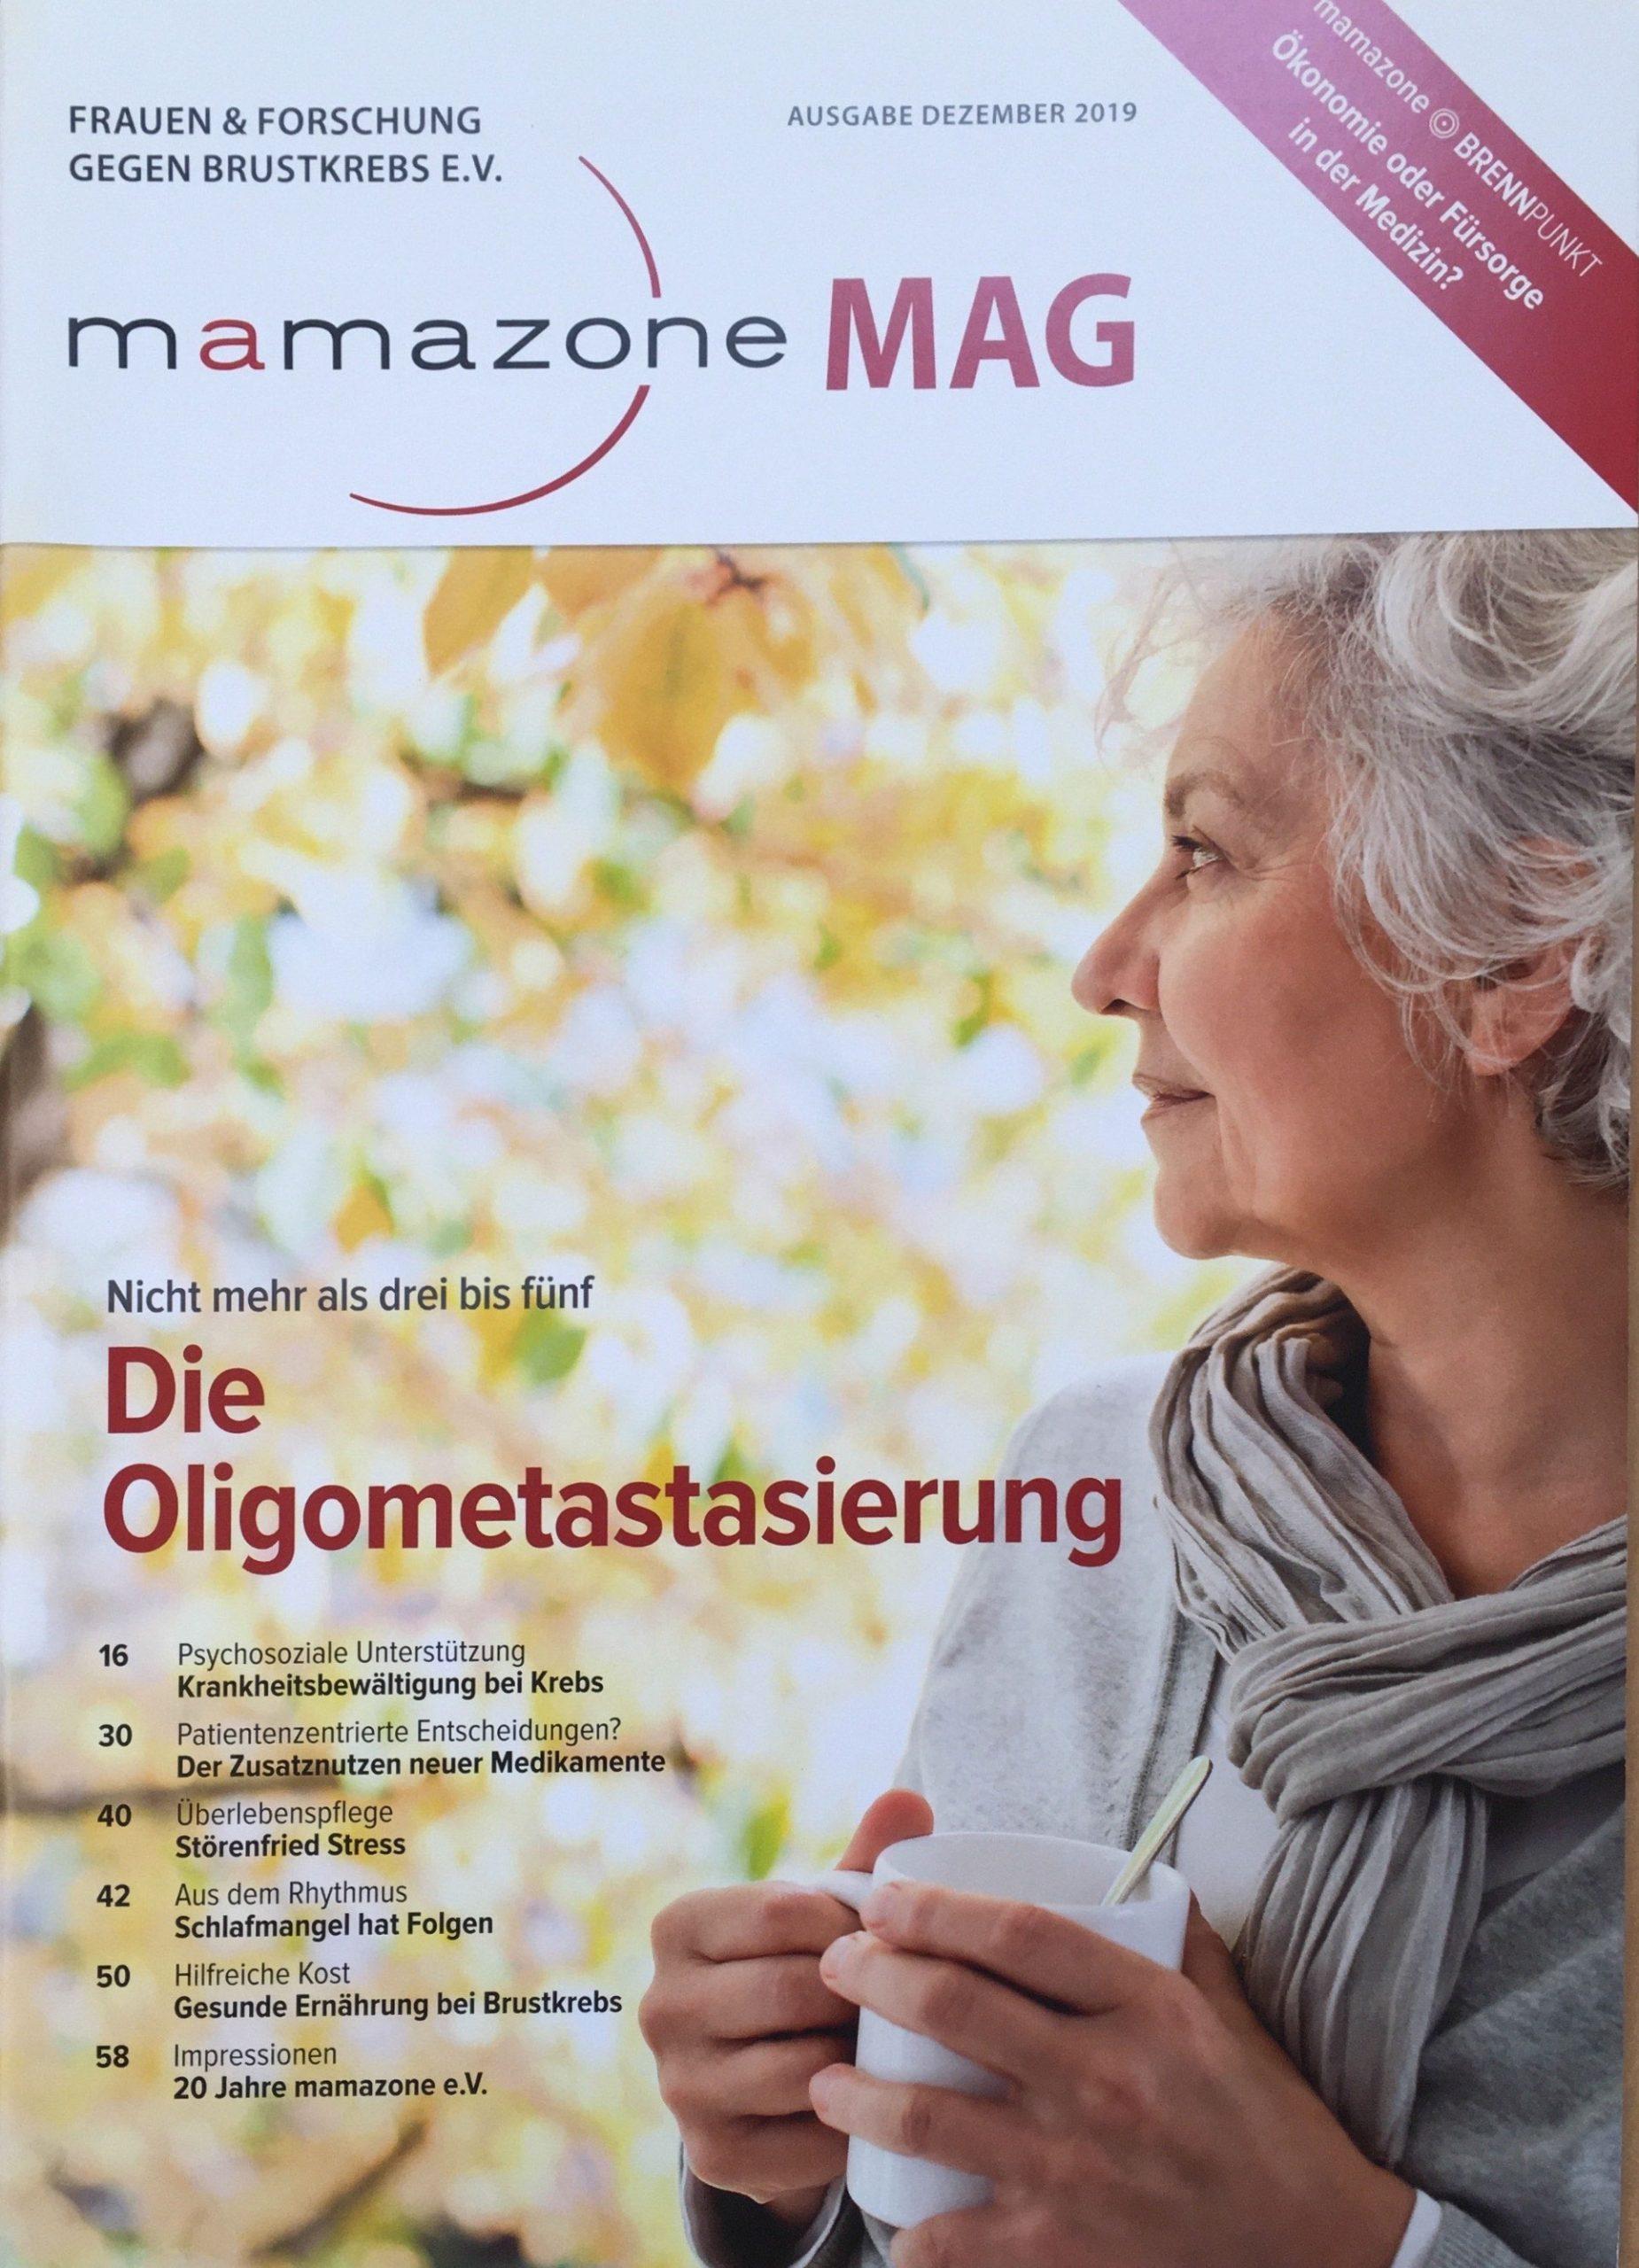 mamazone MAG Ausgabe Dezember 2019